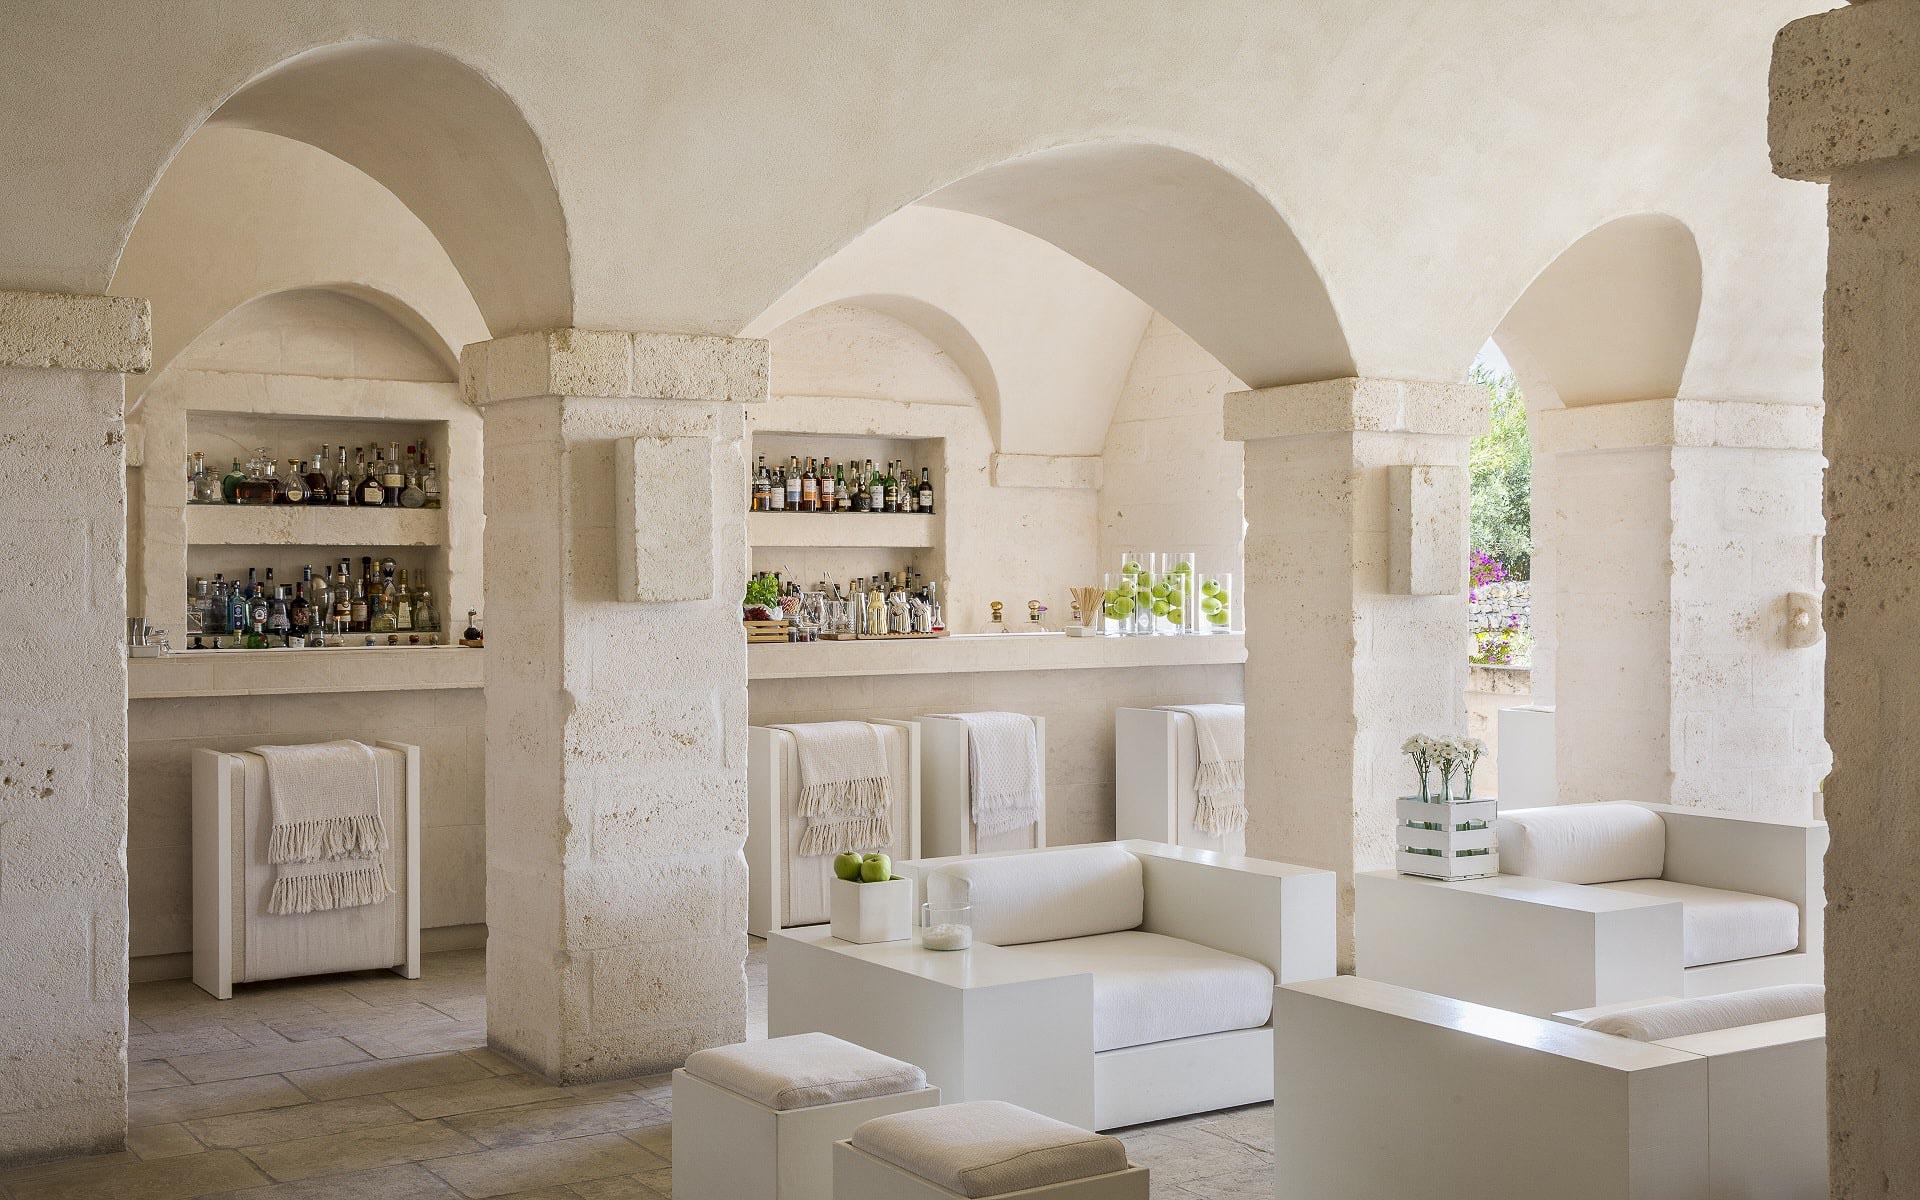 ckanani-wheretostayinpuglia-Borgo Egnazia, Savelletri4.jpg